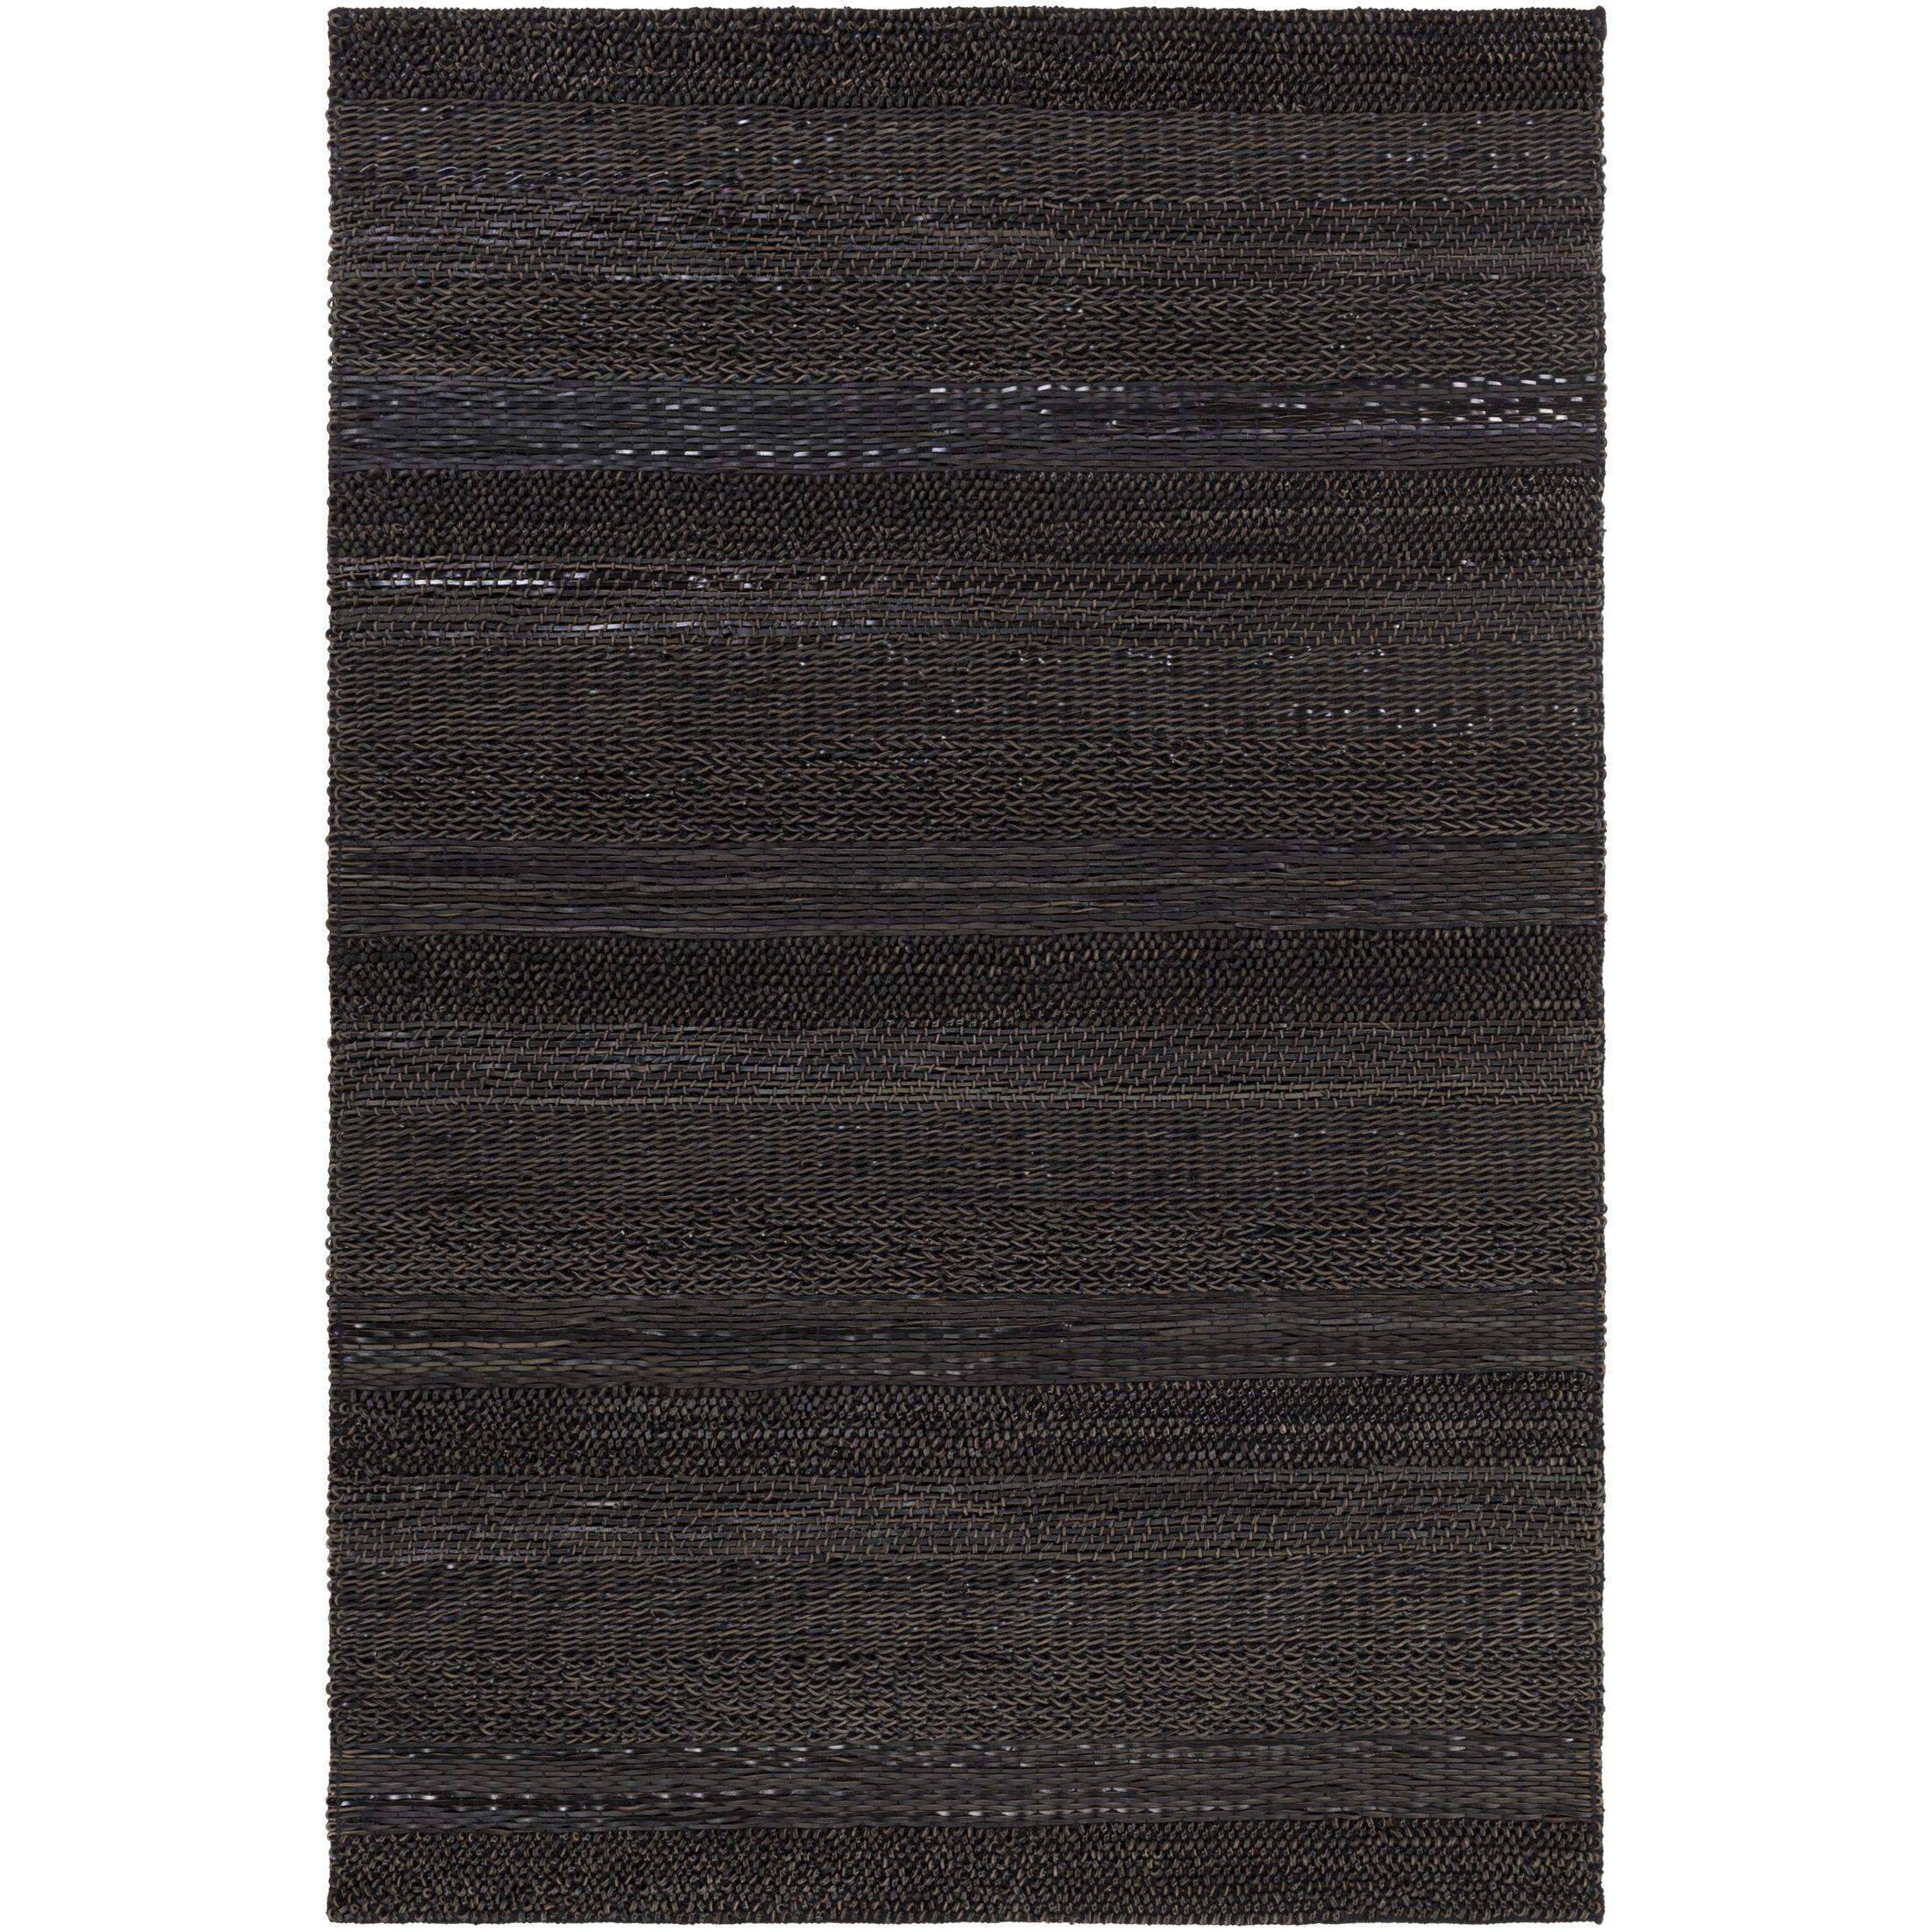 Bennett Hand-Woven Brown/Black Area Rug Rug Size: Rectangle 8' x 10'